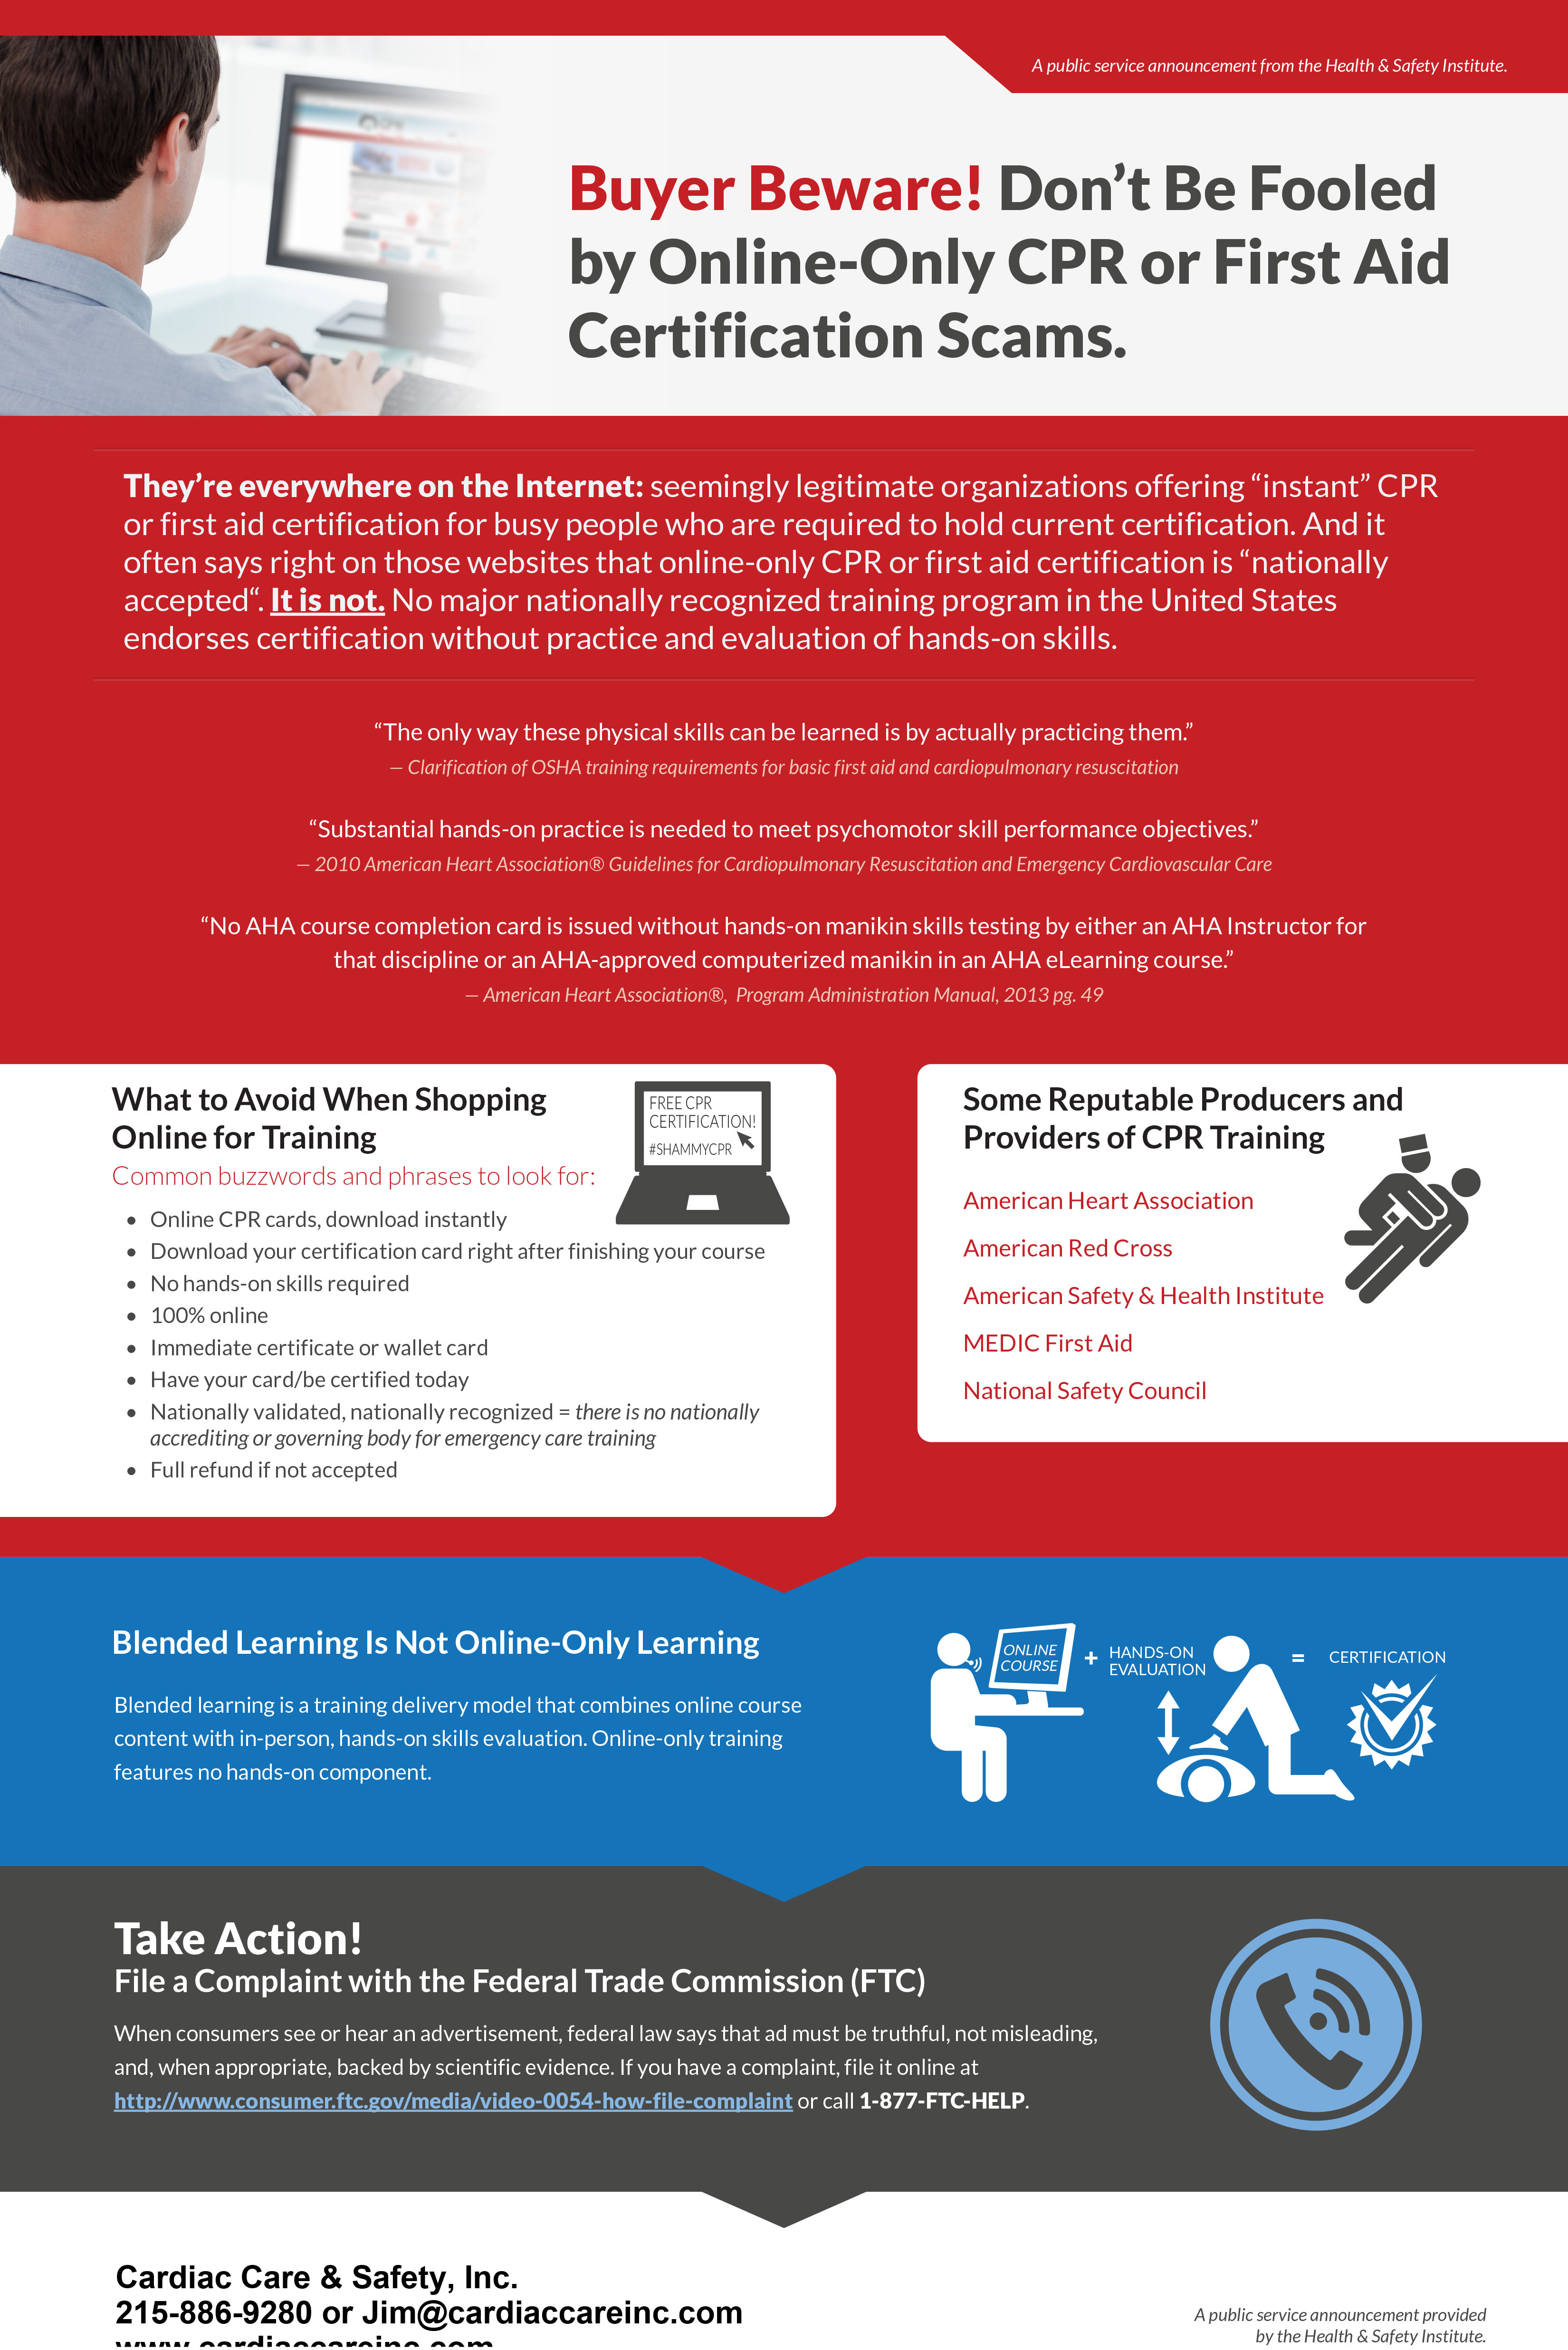 Online Certification Scam